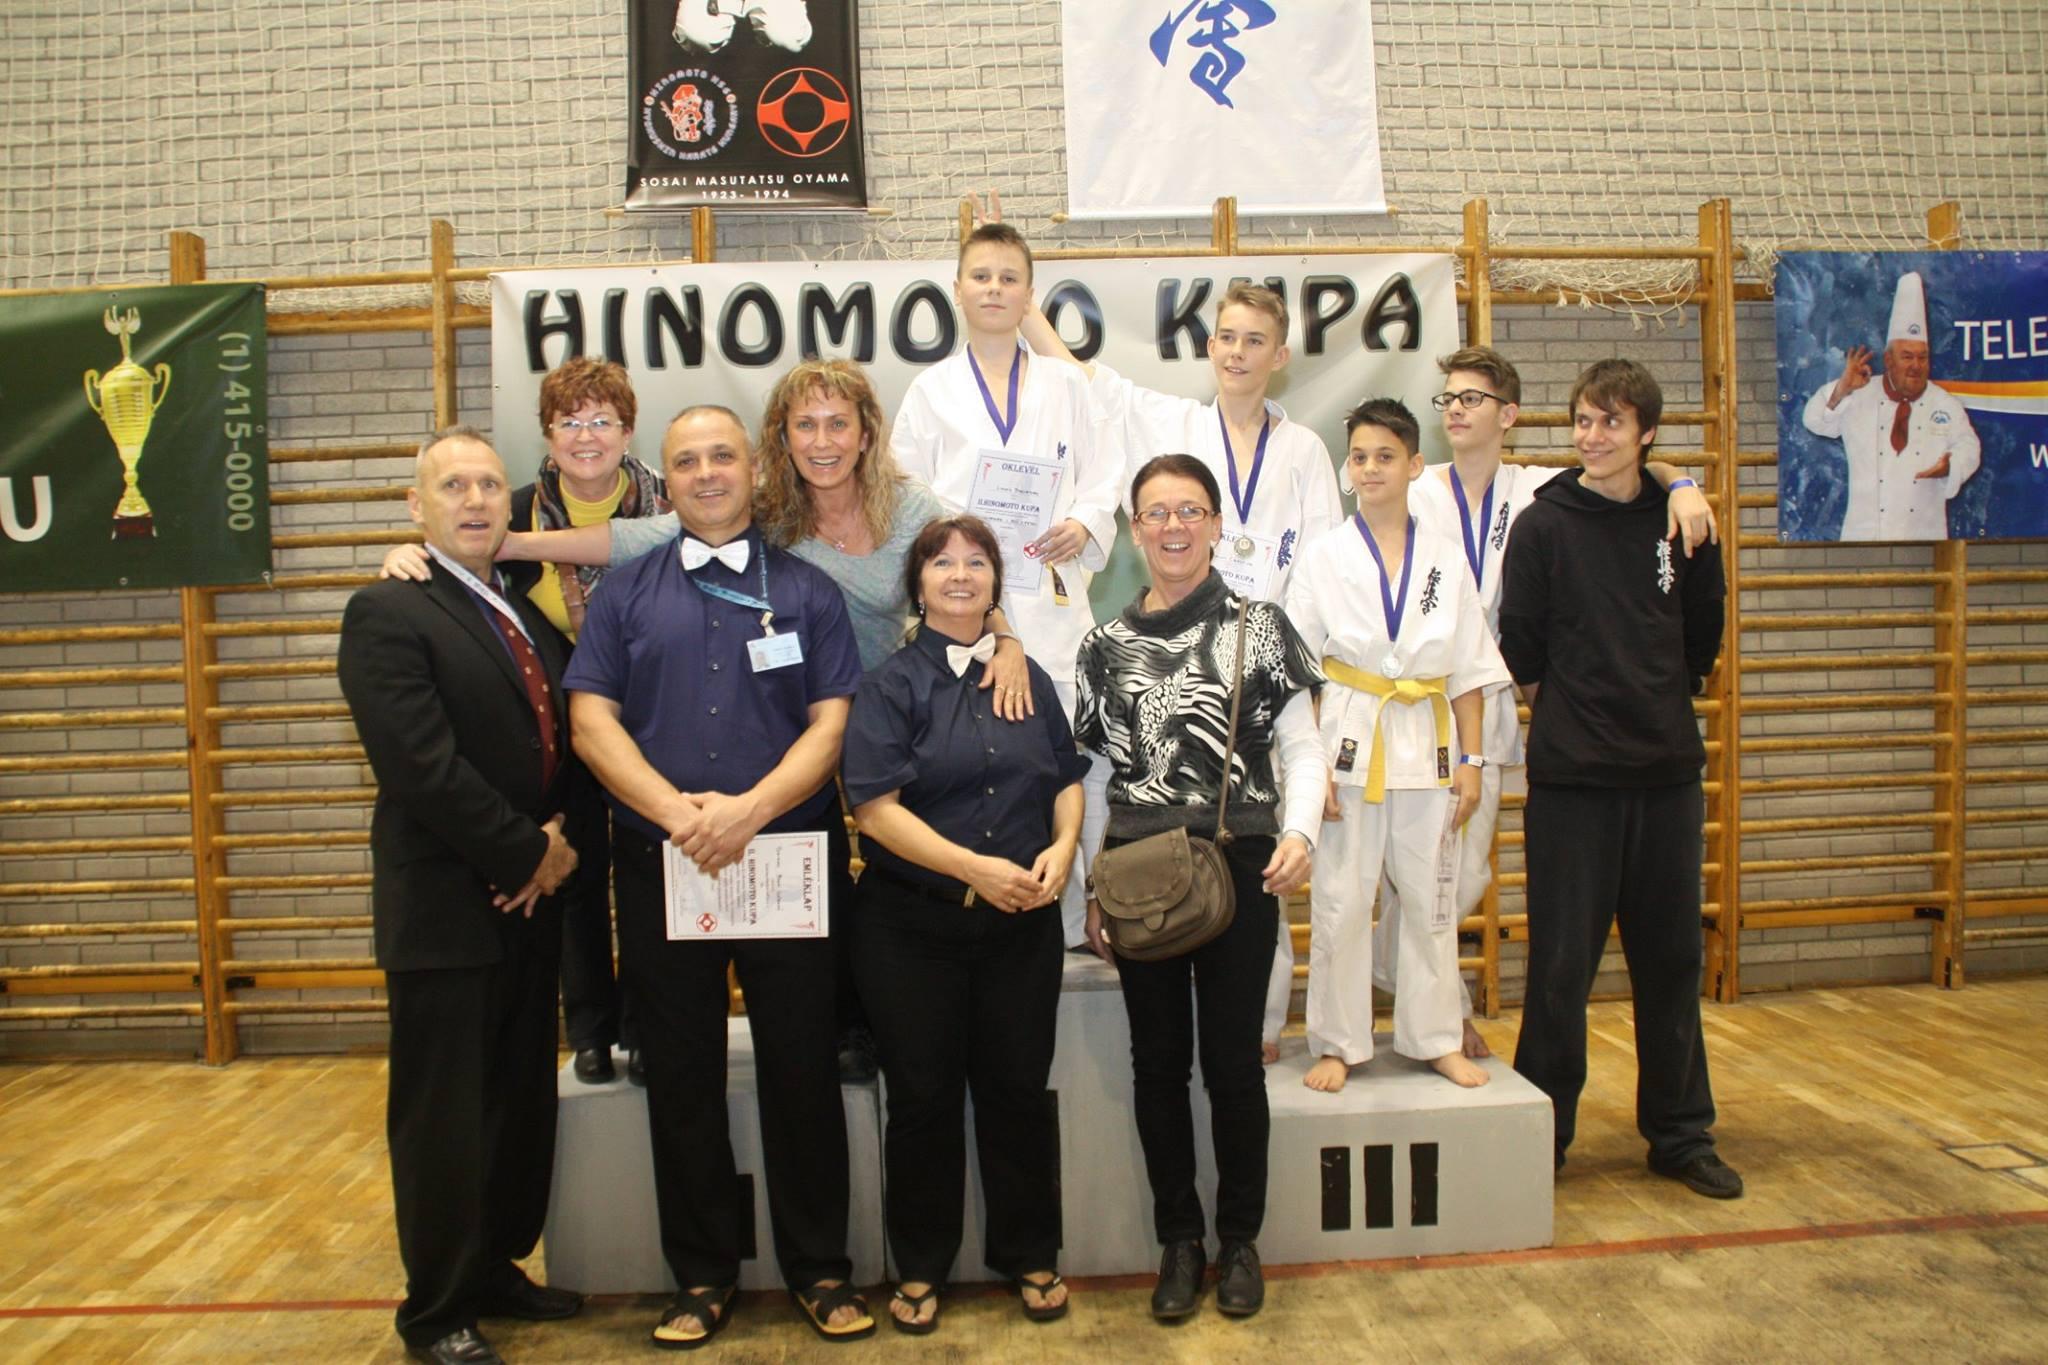 2015 Hinomoto Kupa, Vác 018.jpg